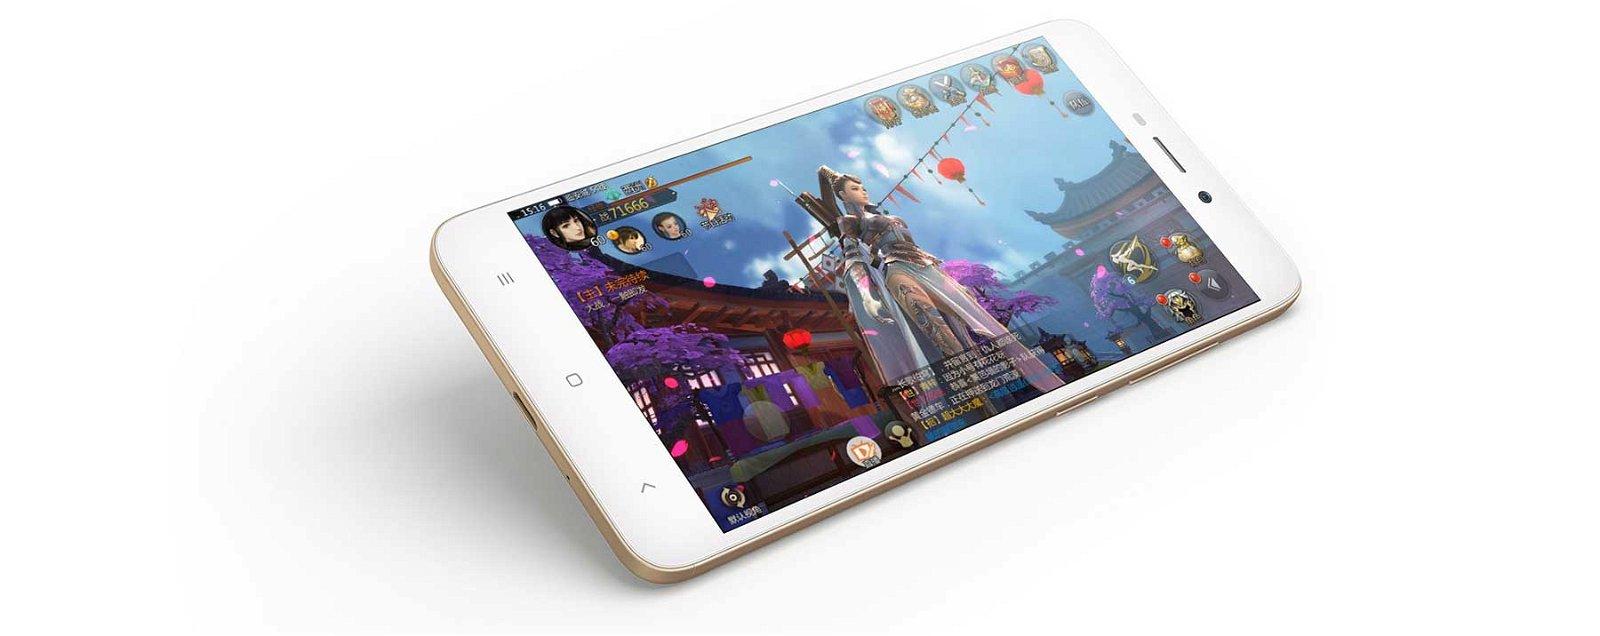 How To  Xiaomi Redmi 4a Unlock Bootloader   Guide